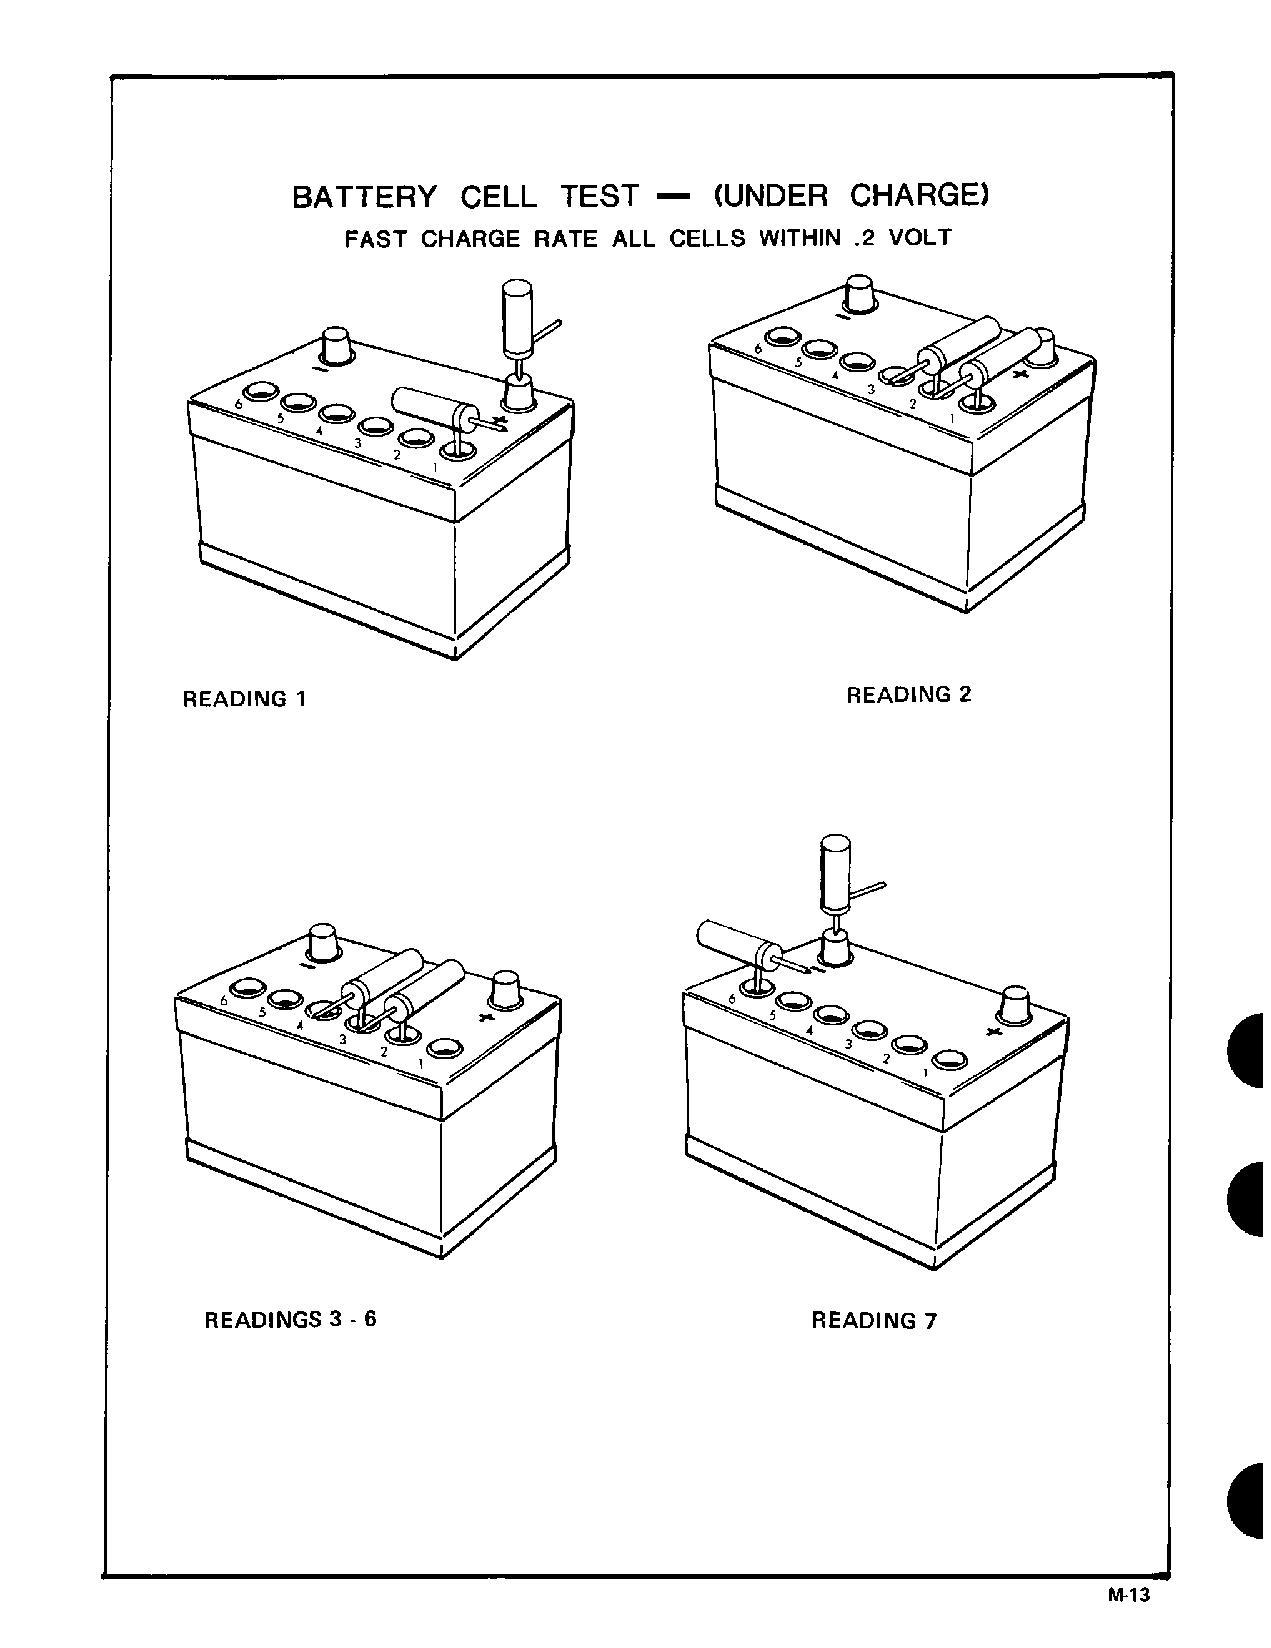 1975 mg midget wiring diagram mgb wiring diagram 1975 mg midget wiring